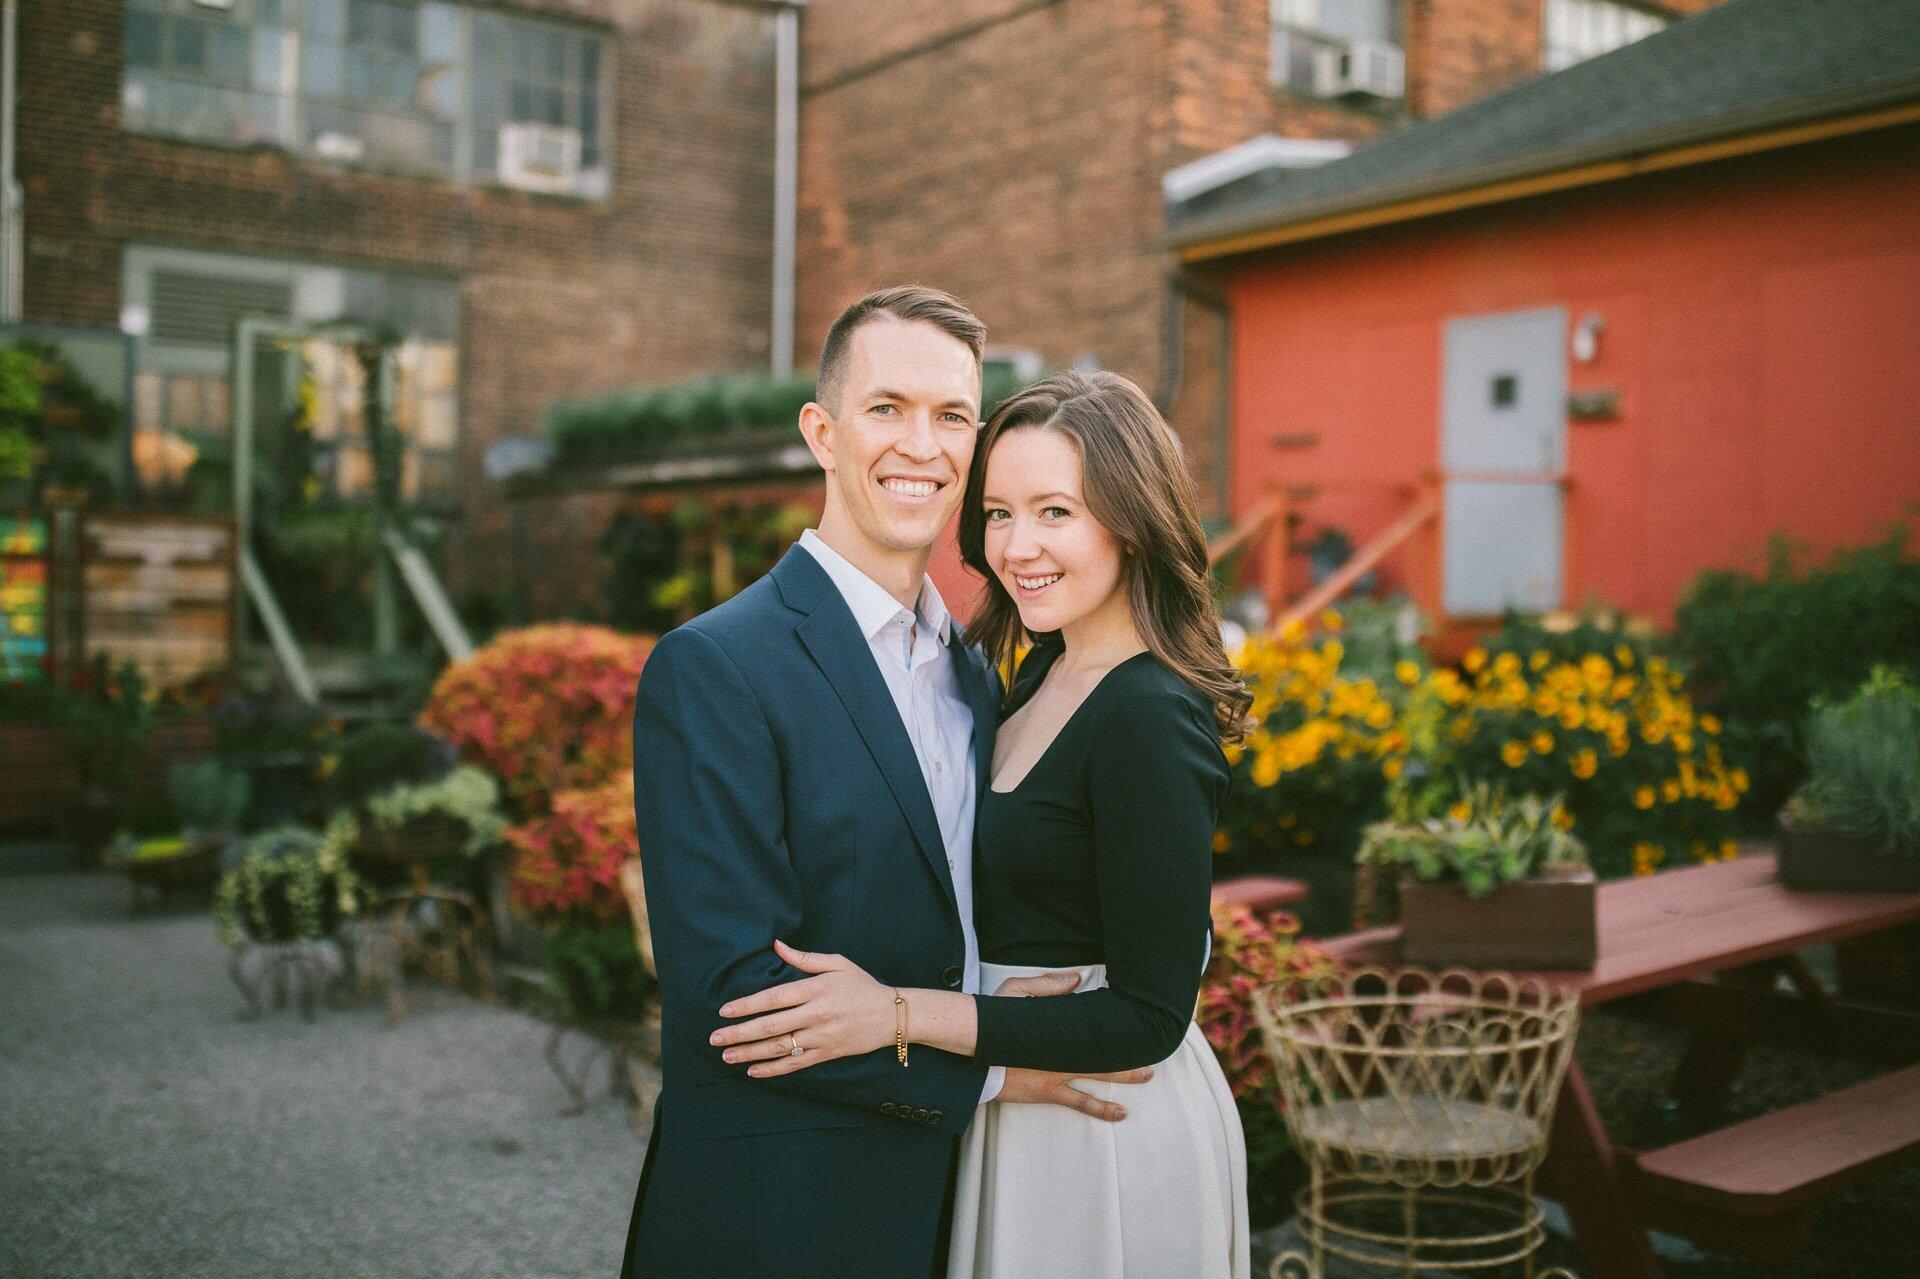 78th Street Studio Engagement and Wedding Photographer 15.jpg